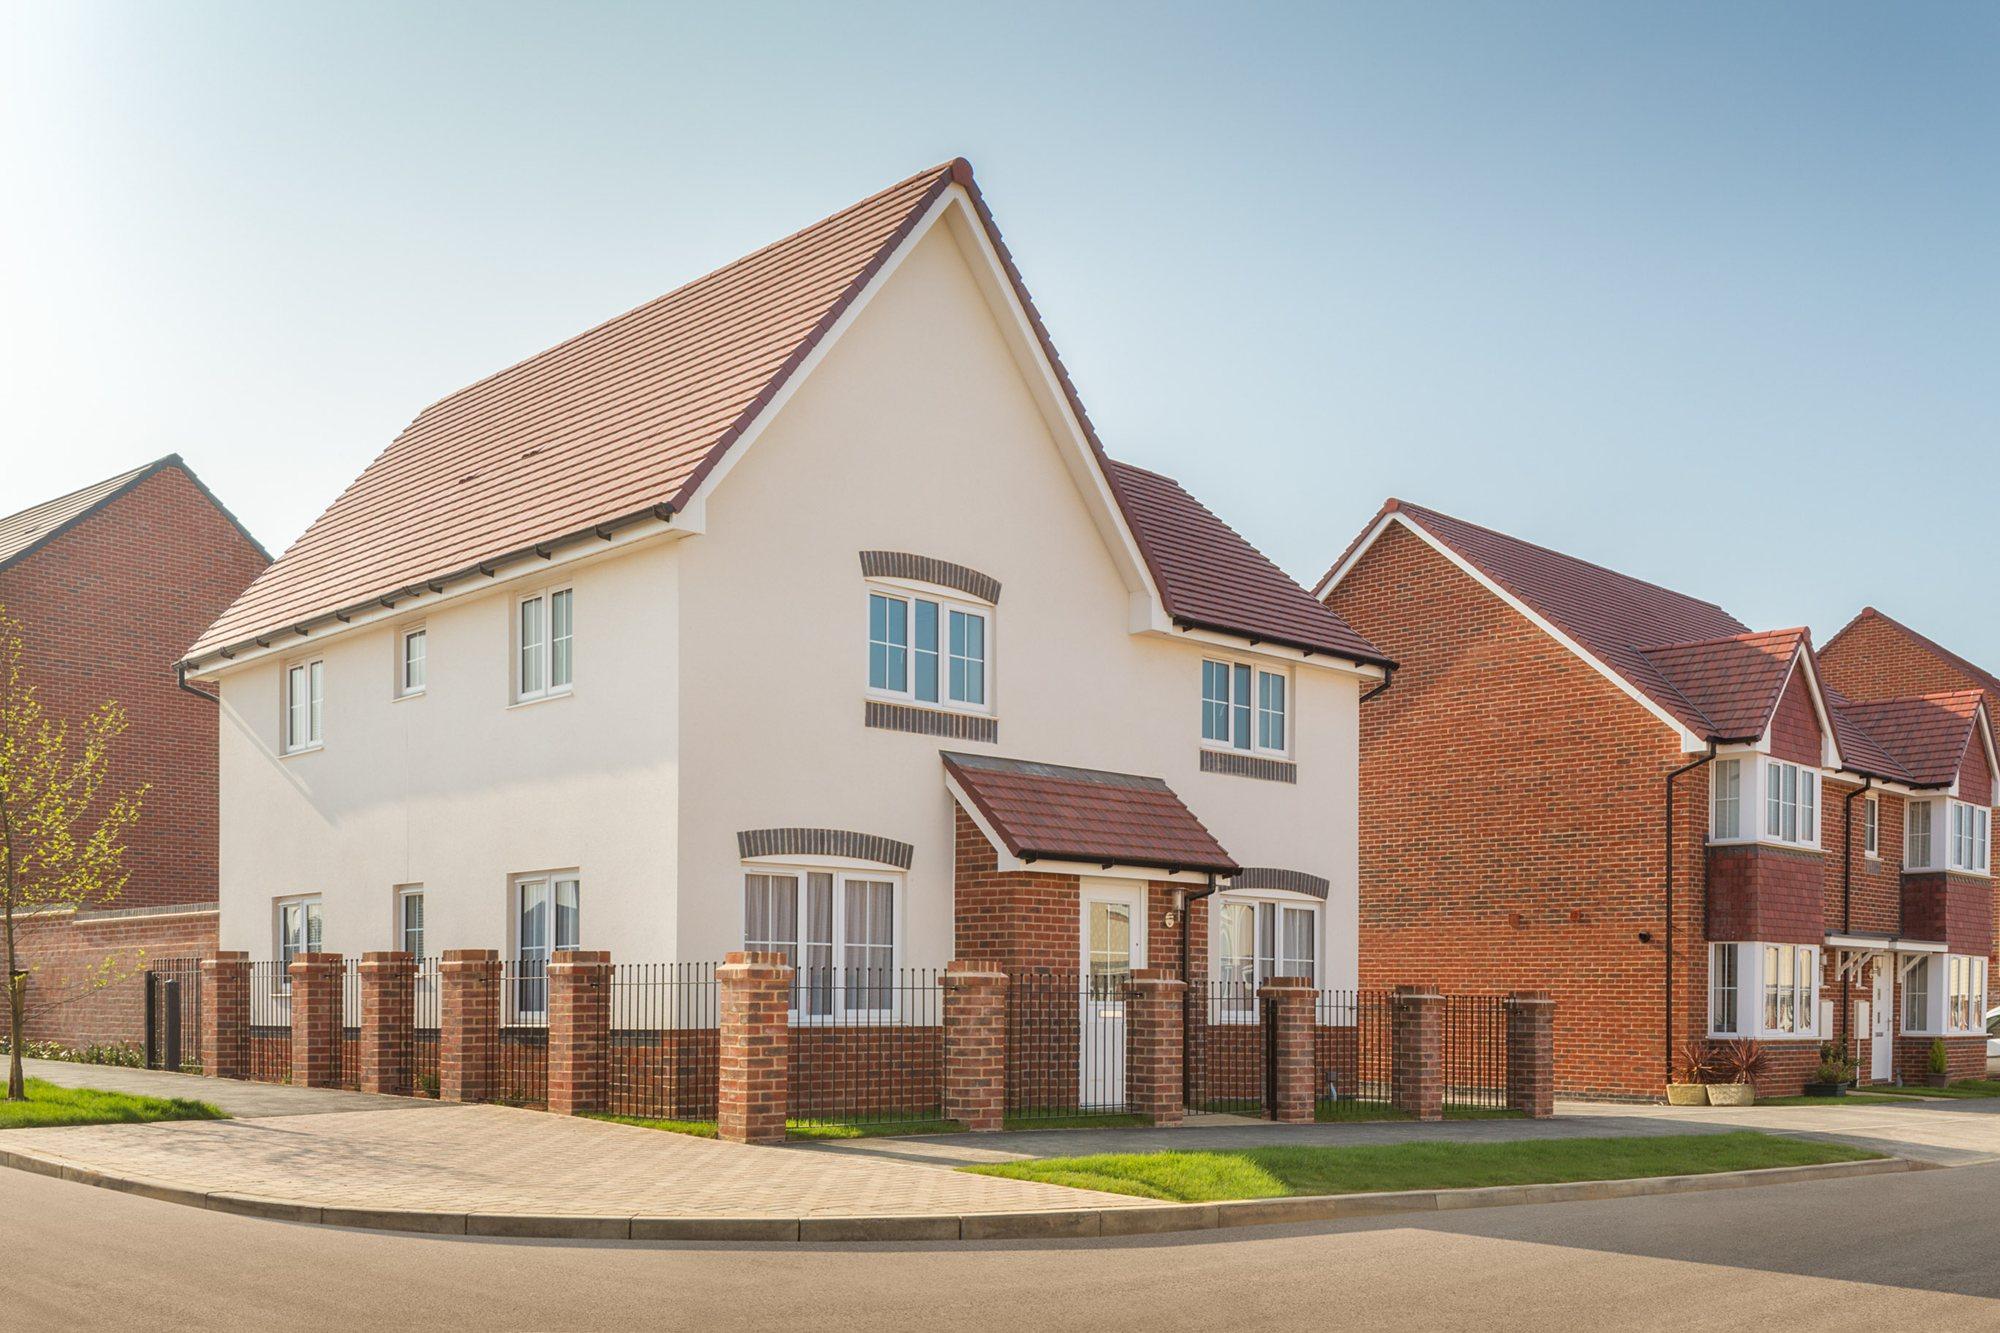 New Build Homes in Littlehampton